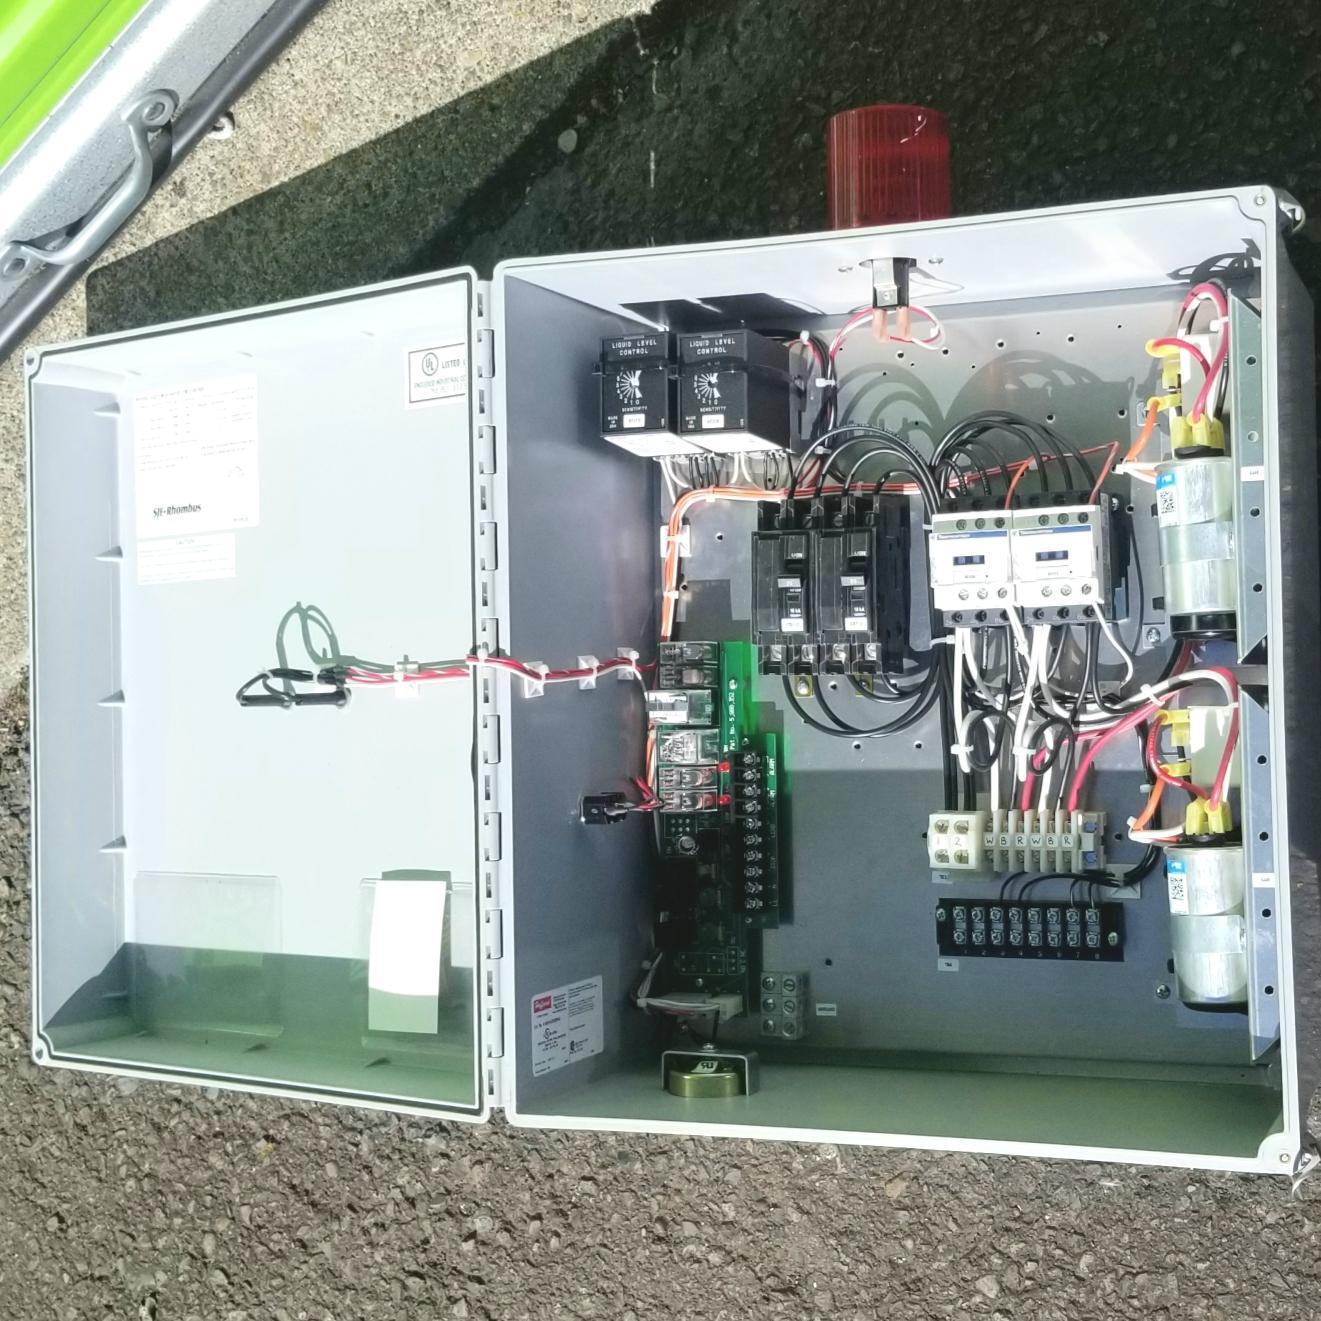 SJE Rhombus Duplex Type 4X Pump Control Panel 1231W114H5E12B17A54M 1ph